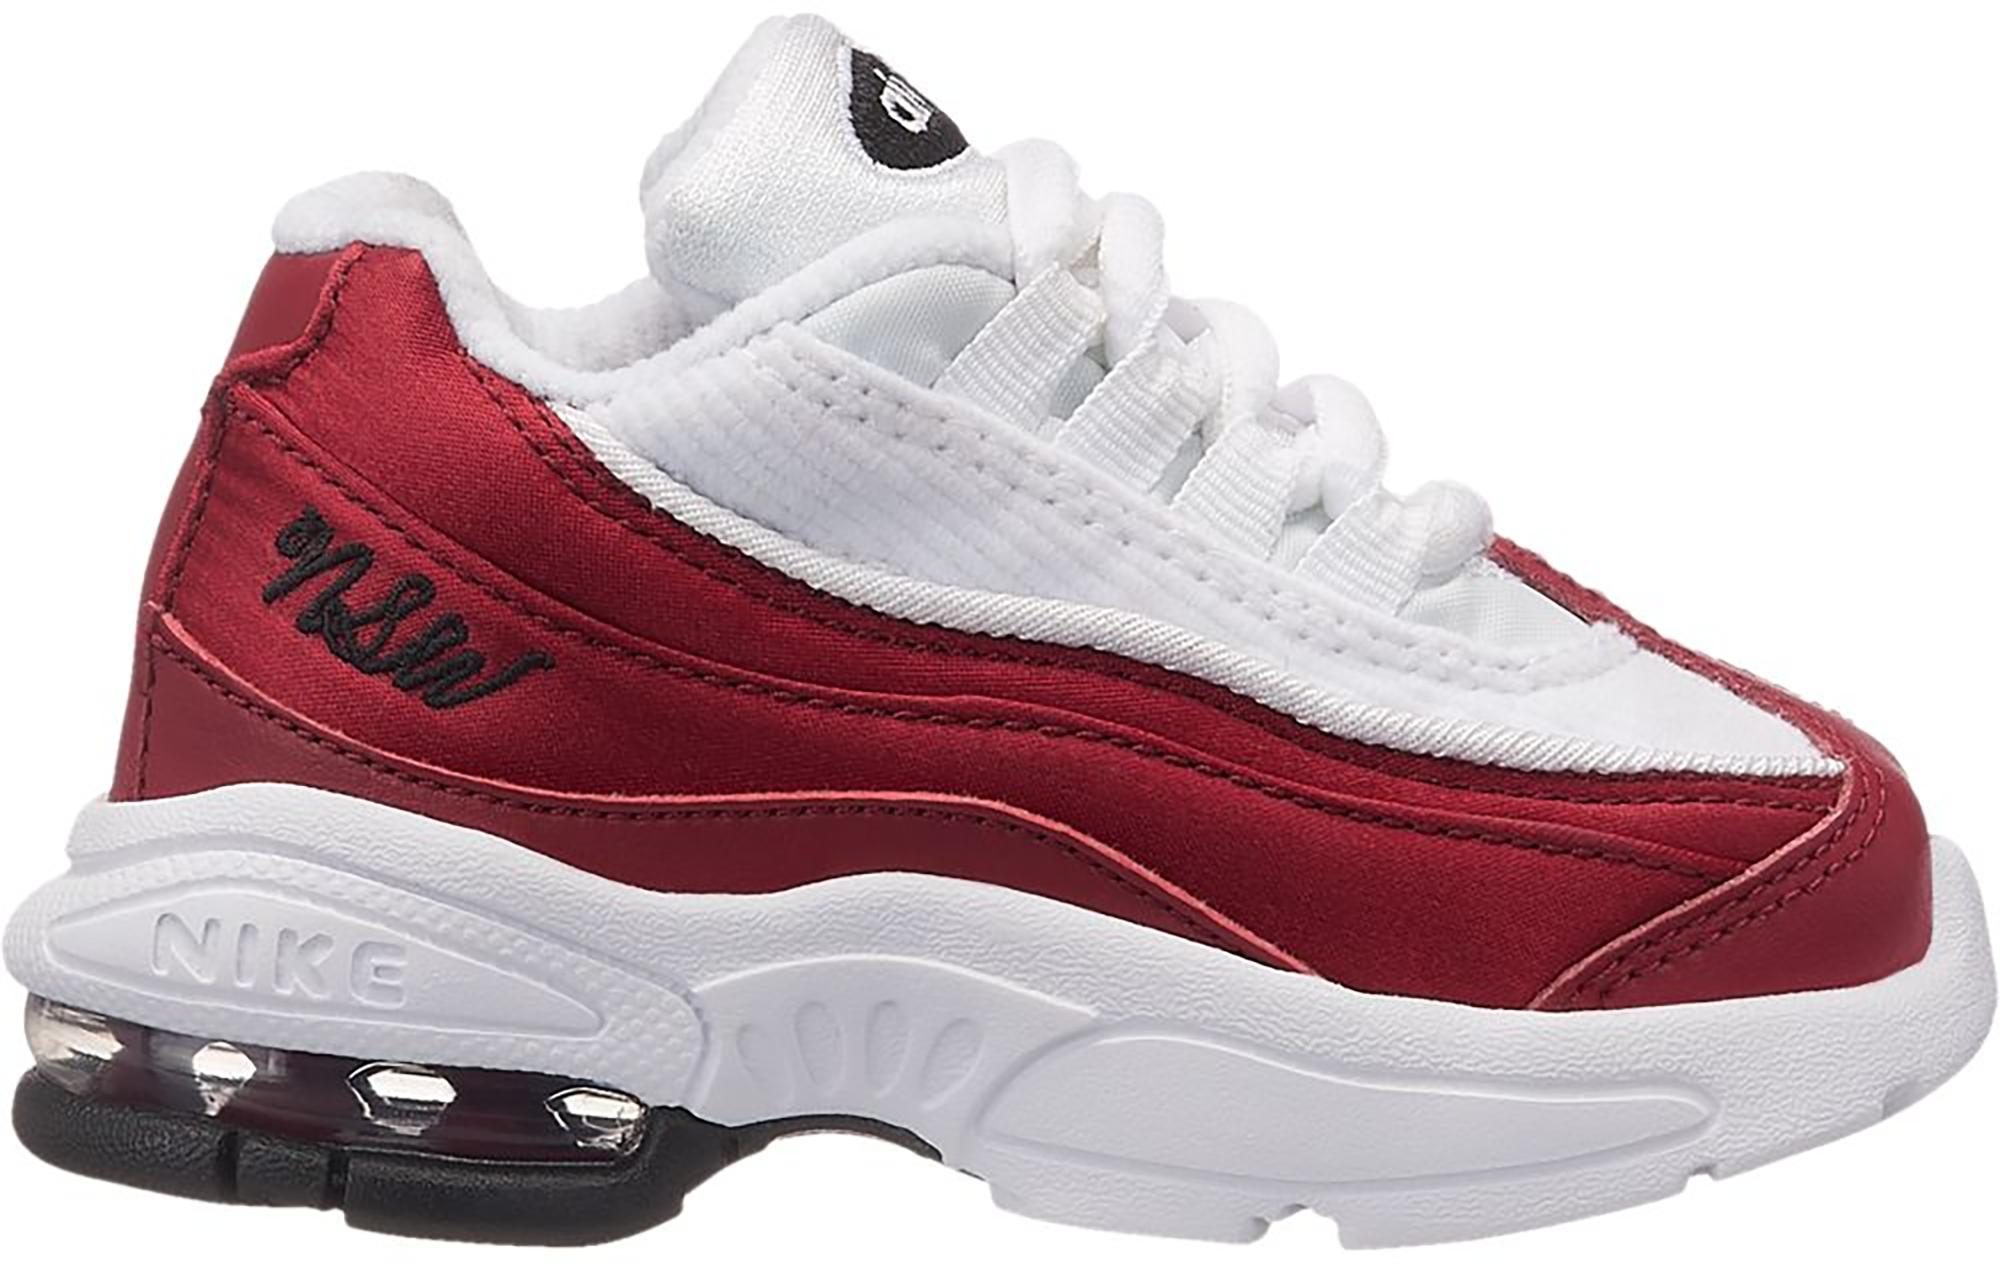 Nike Air Max 95 LX Red Crush (TD